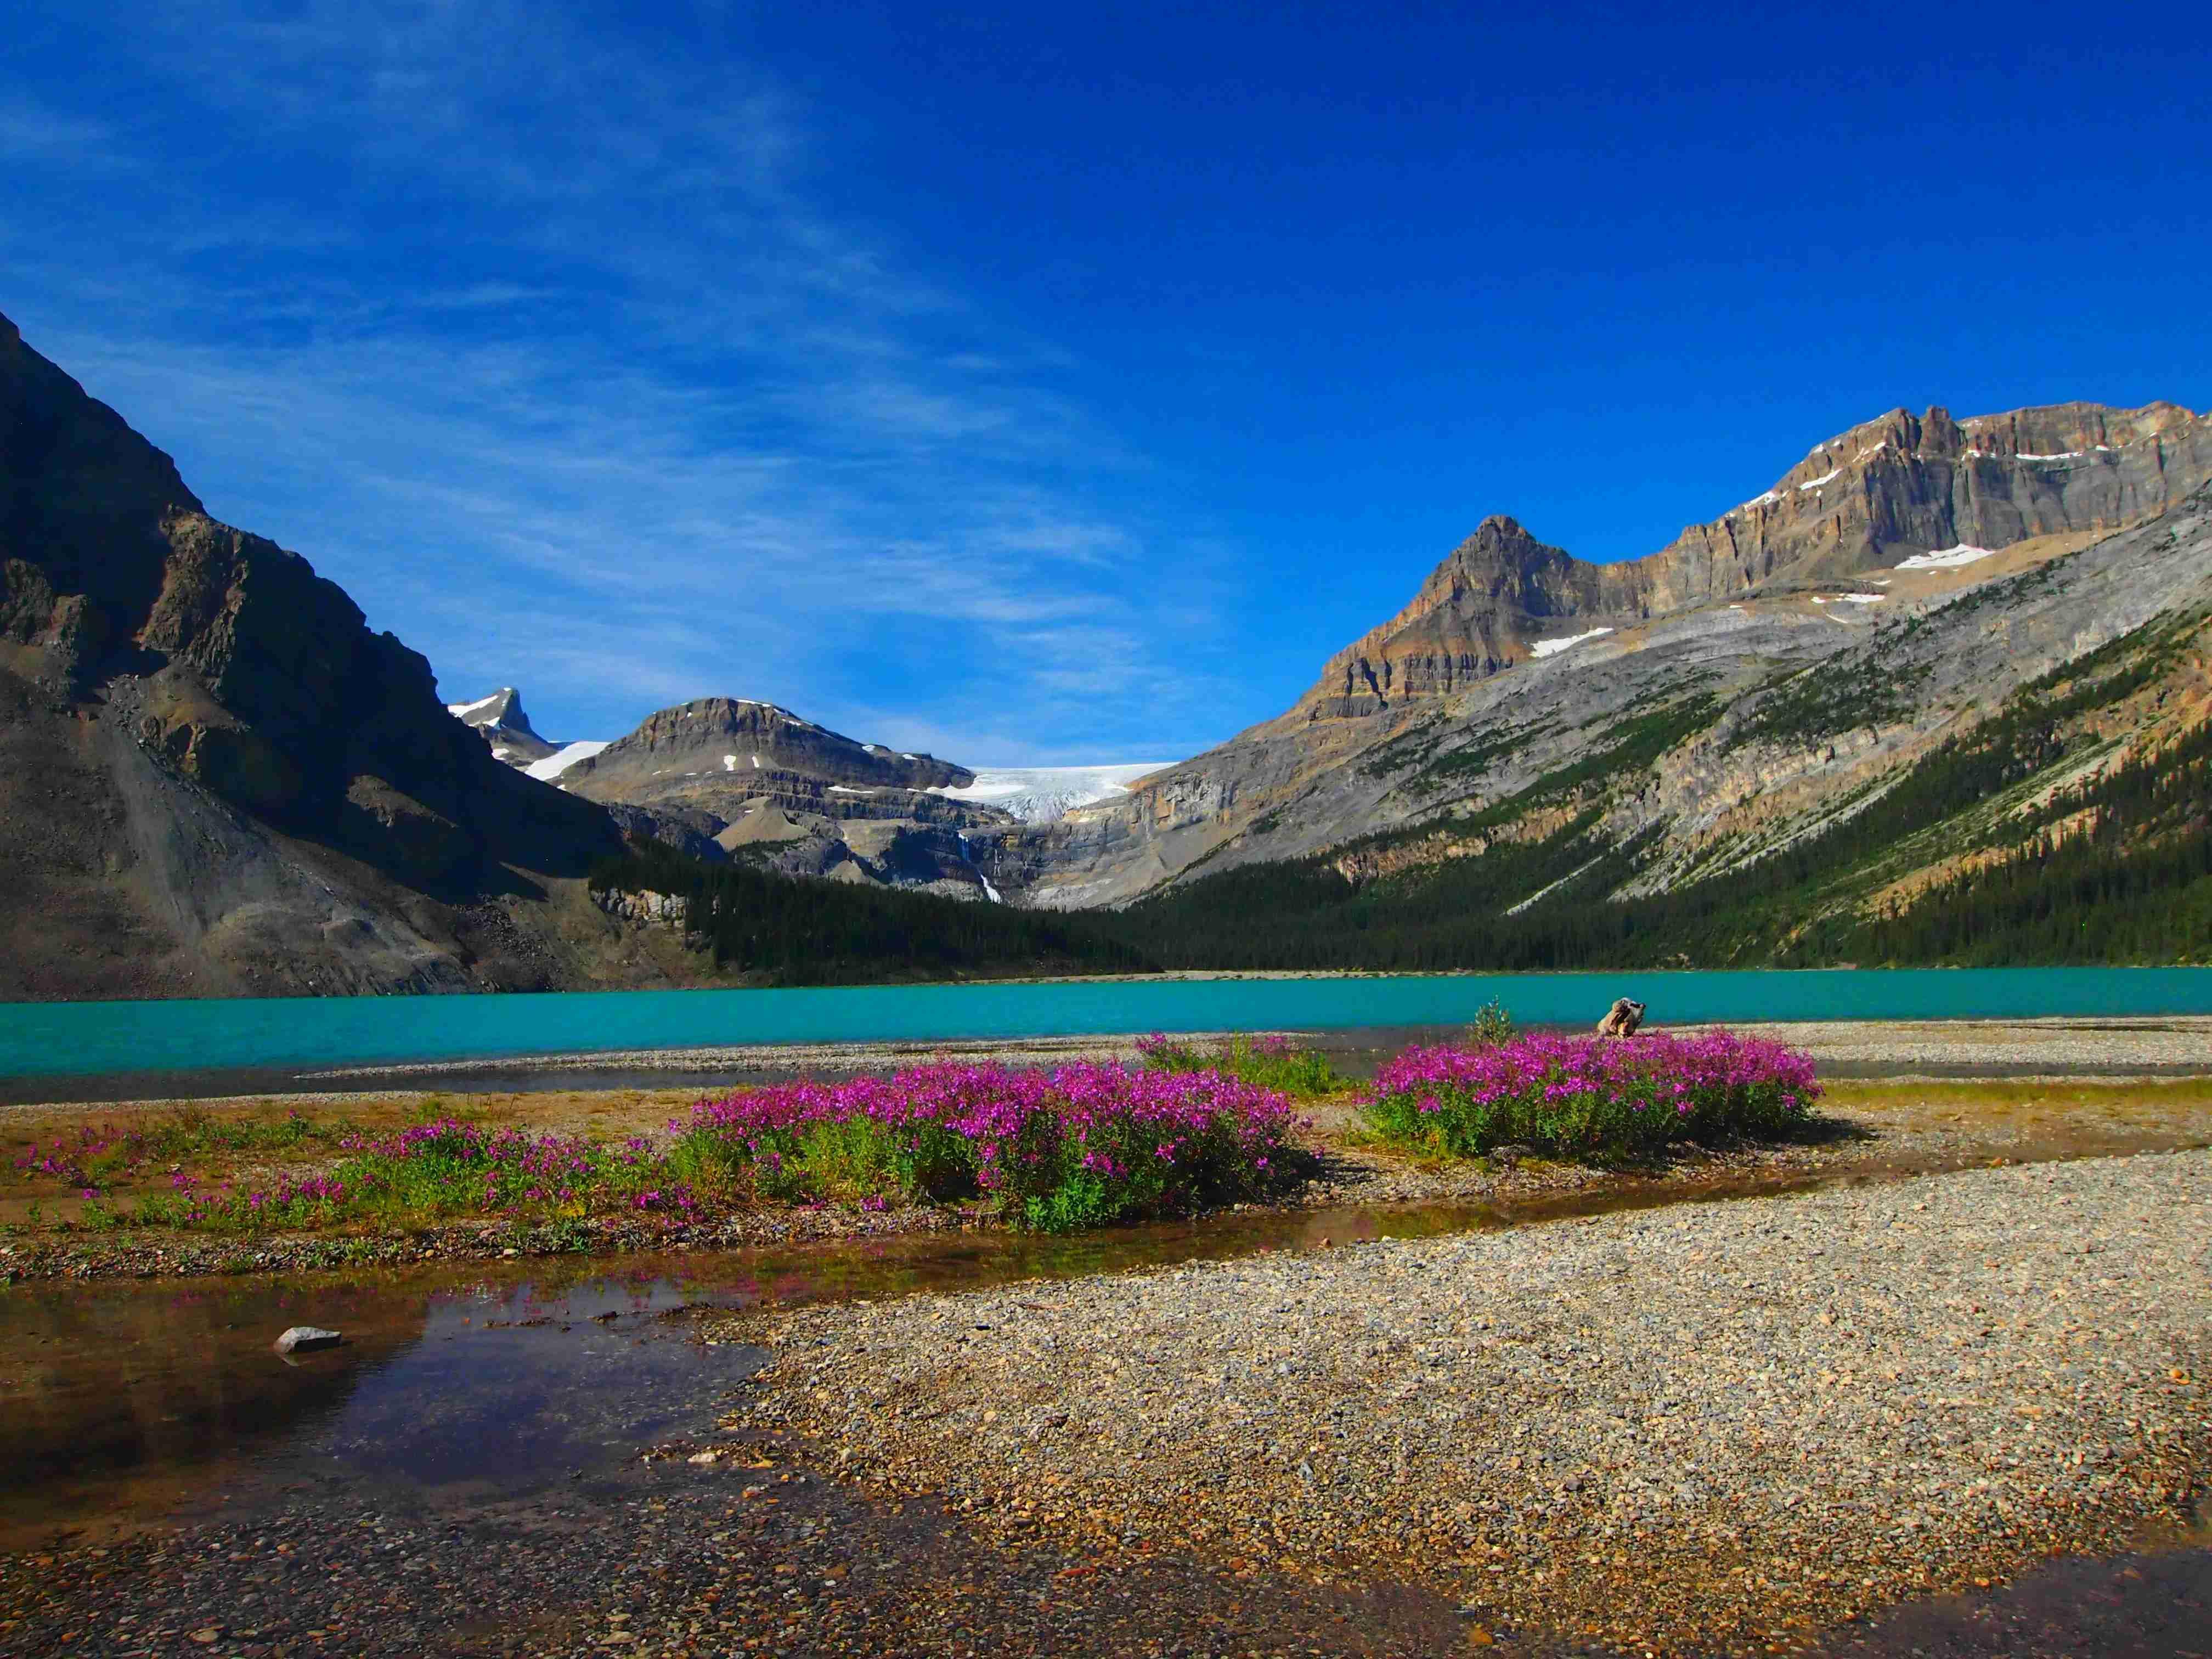 Bow Lake, Banff National Park, Alberta. Photo: Elen Turner